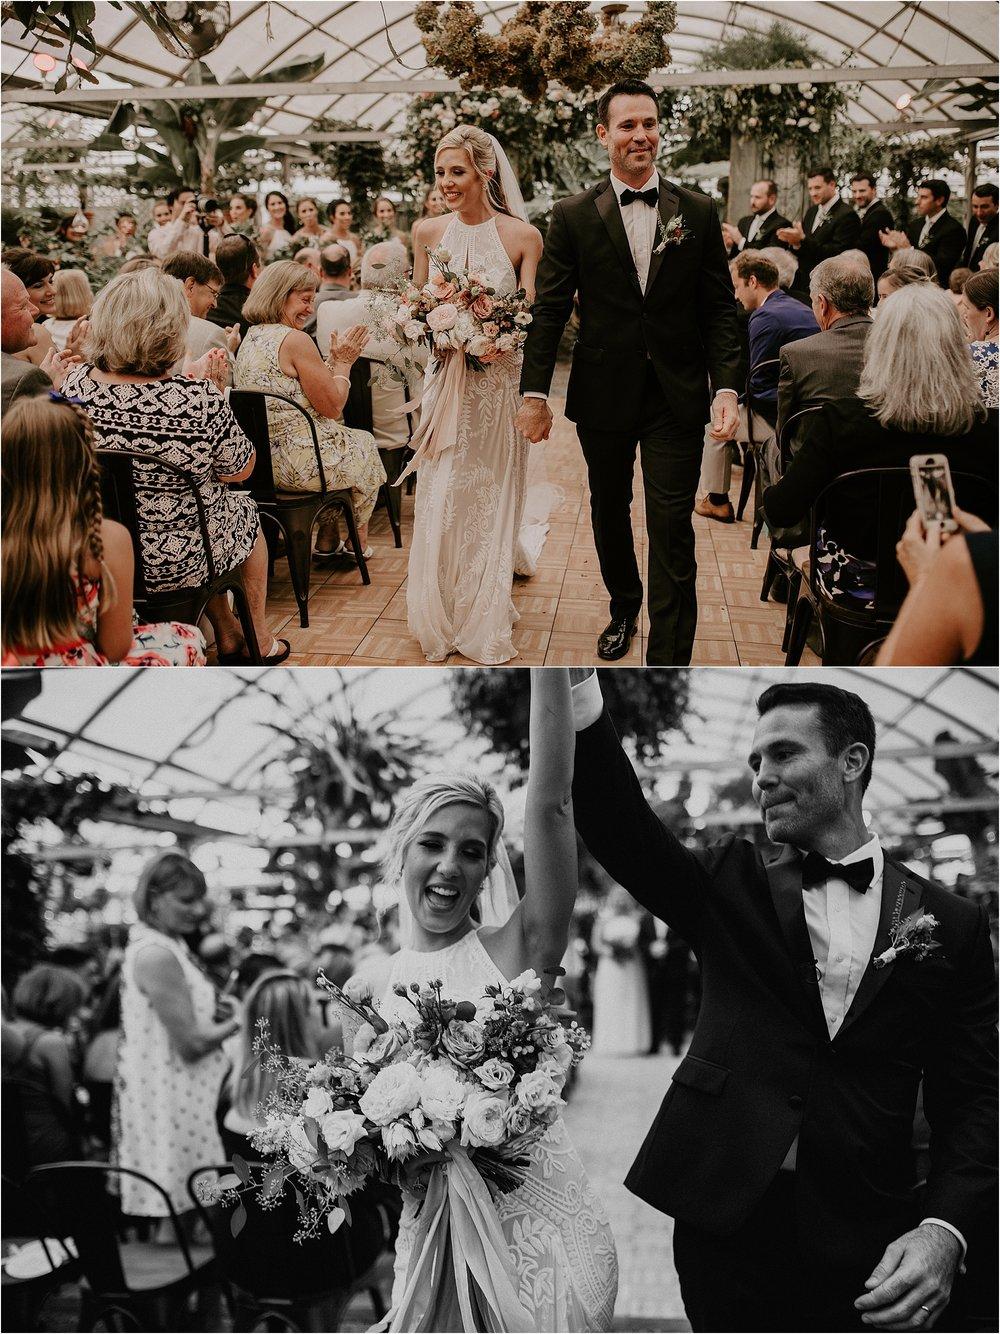 Sarah_Brookhart_Hortulus_Farm_Garden_and_Nursey_Wedding_Photographer_0050.jpg